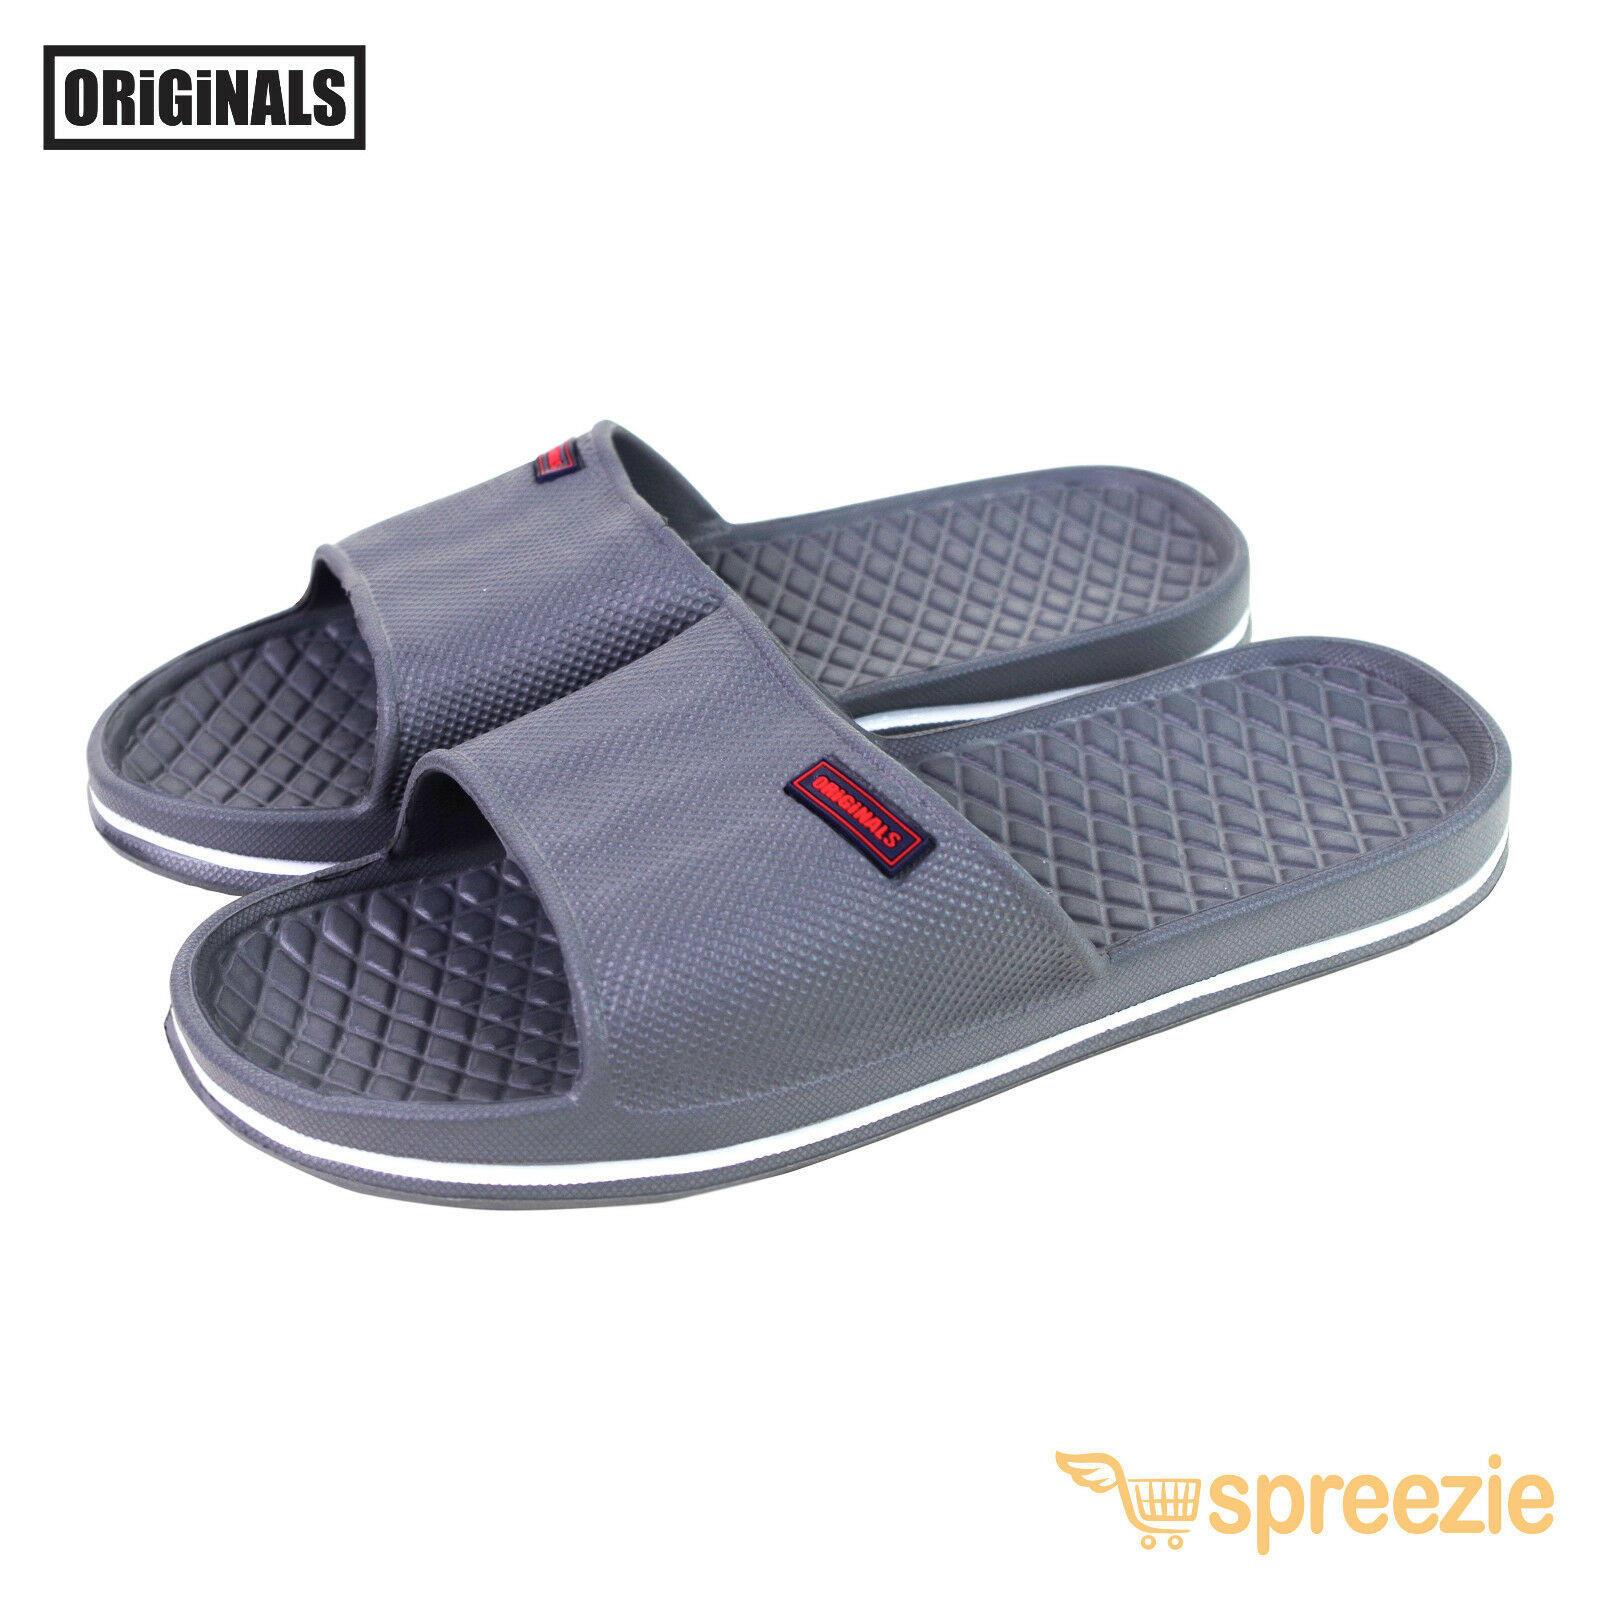 Grey Men's Sandals Sport Slides Slip On Beach Slippers House Shoes Footwear New